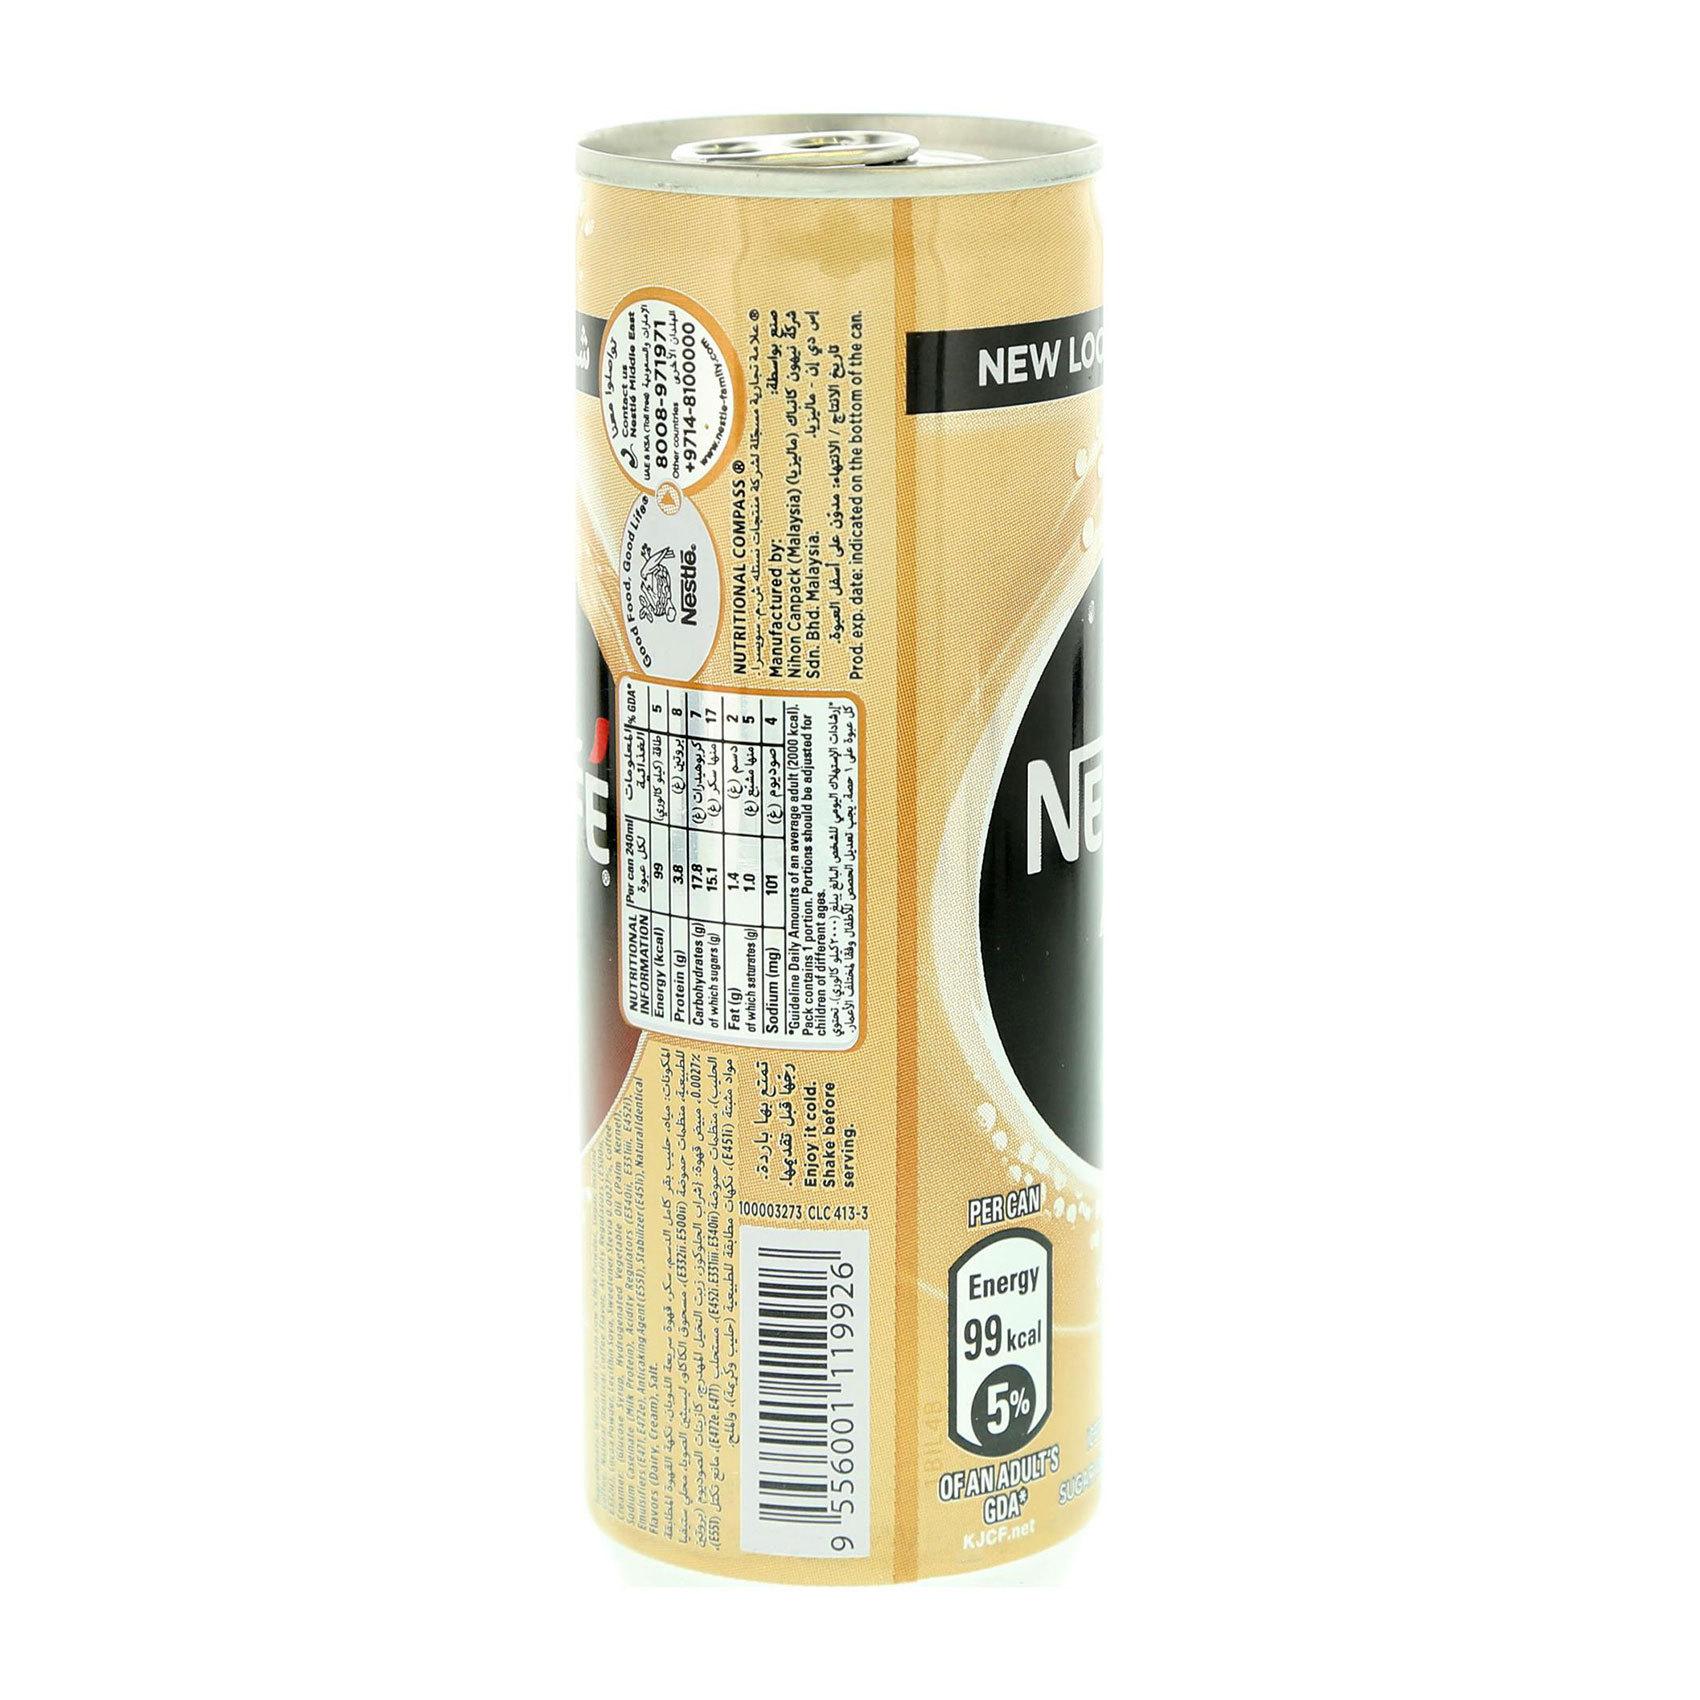 Nescafe latte Ice Coffee 240ml